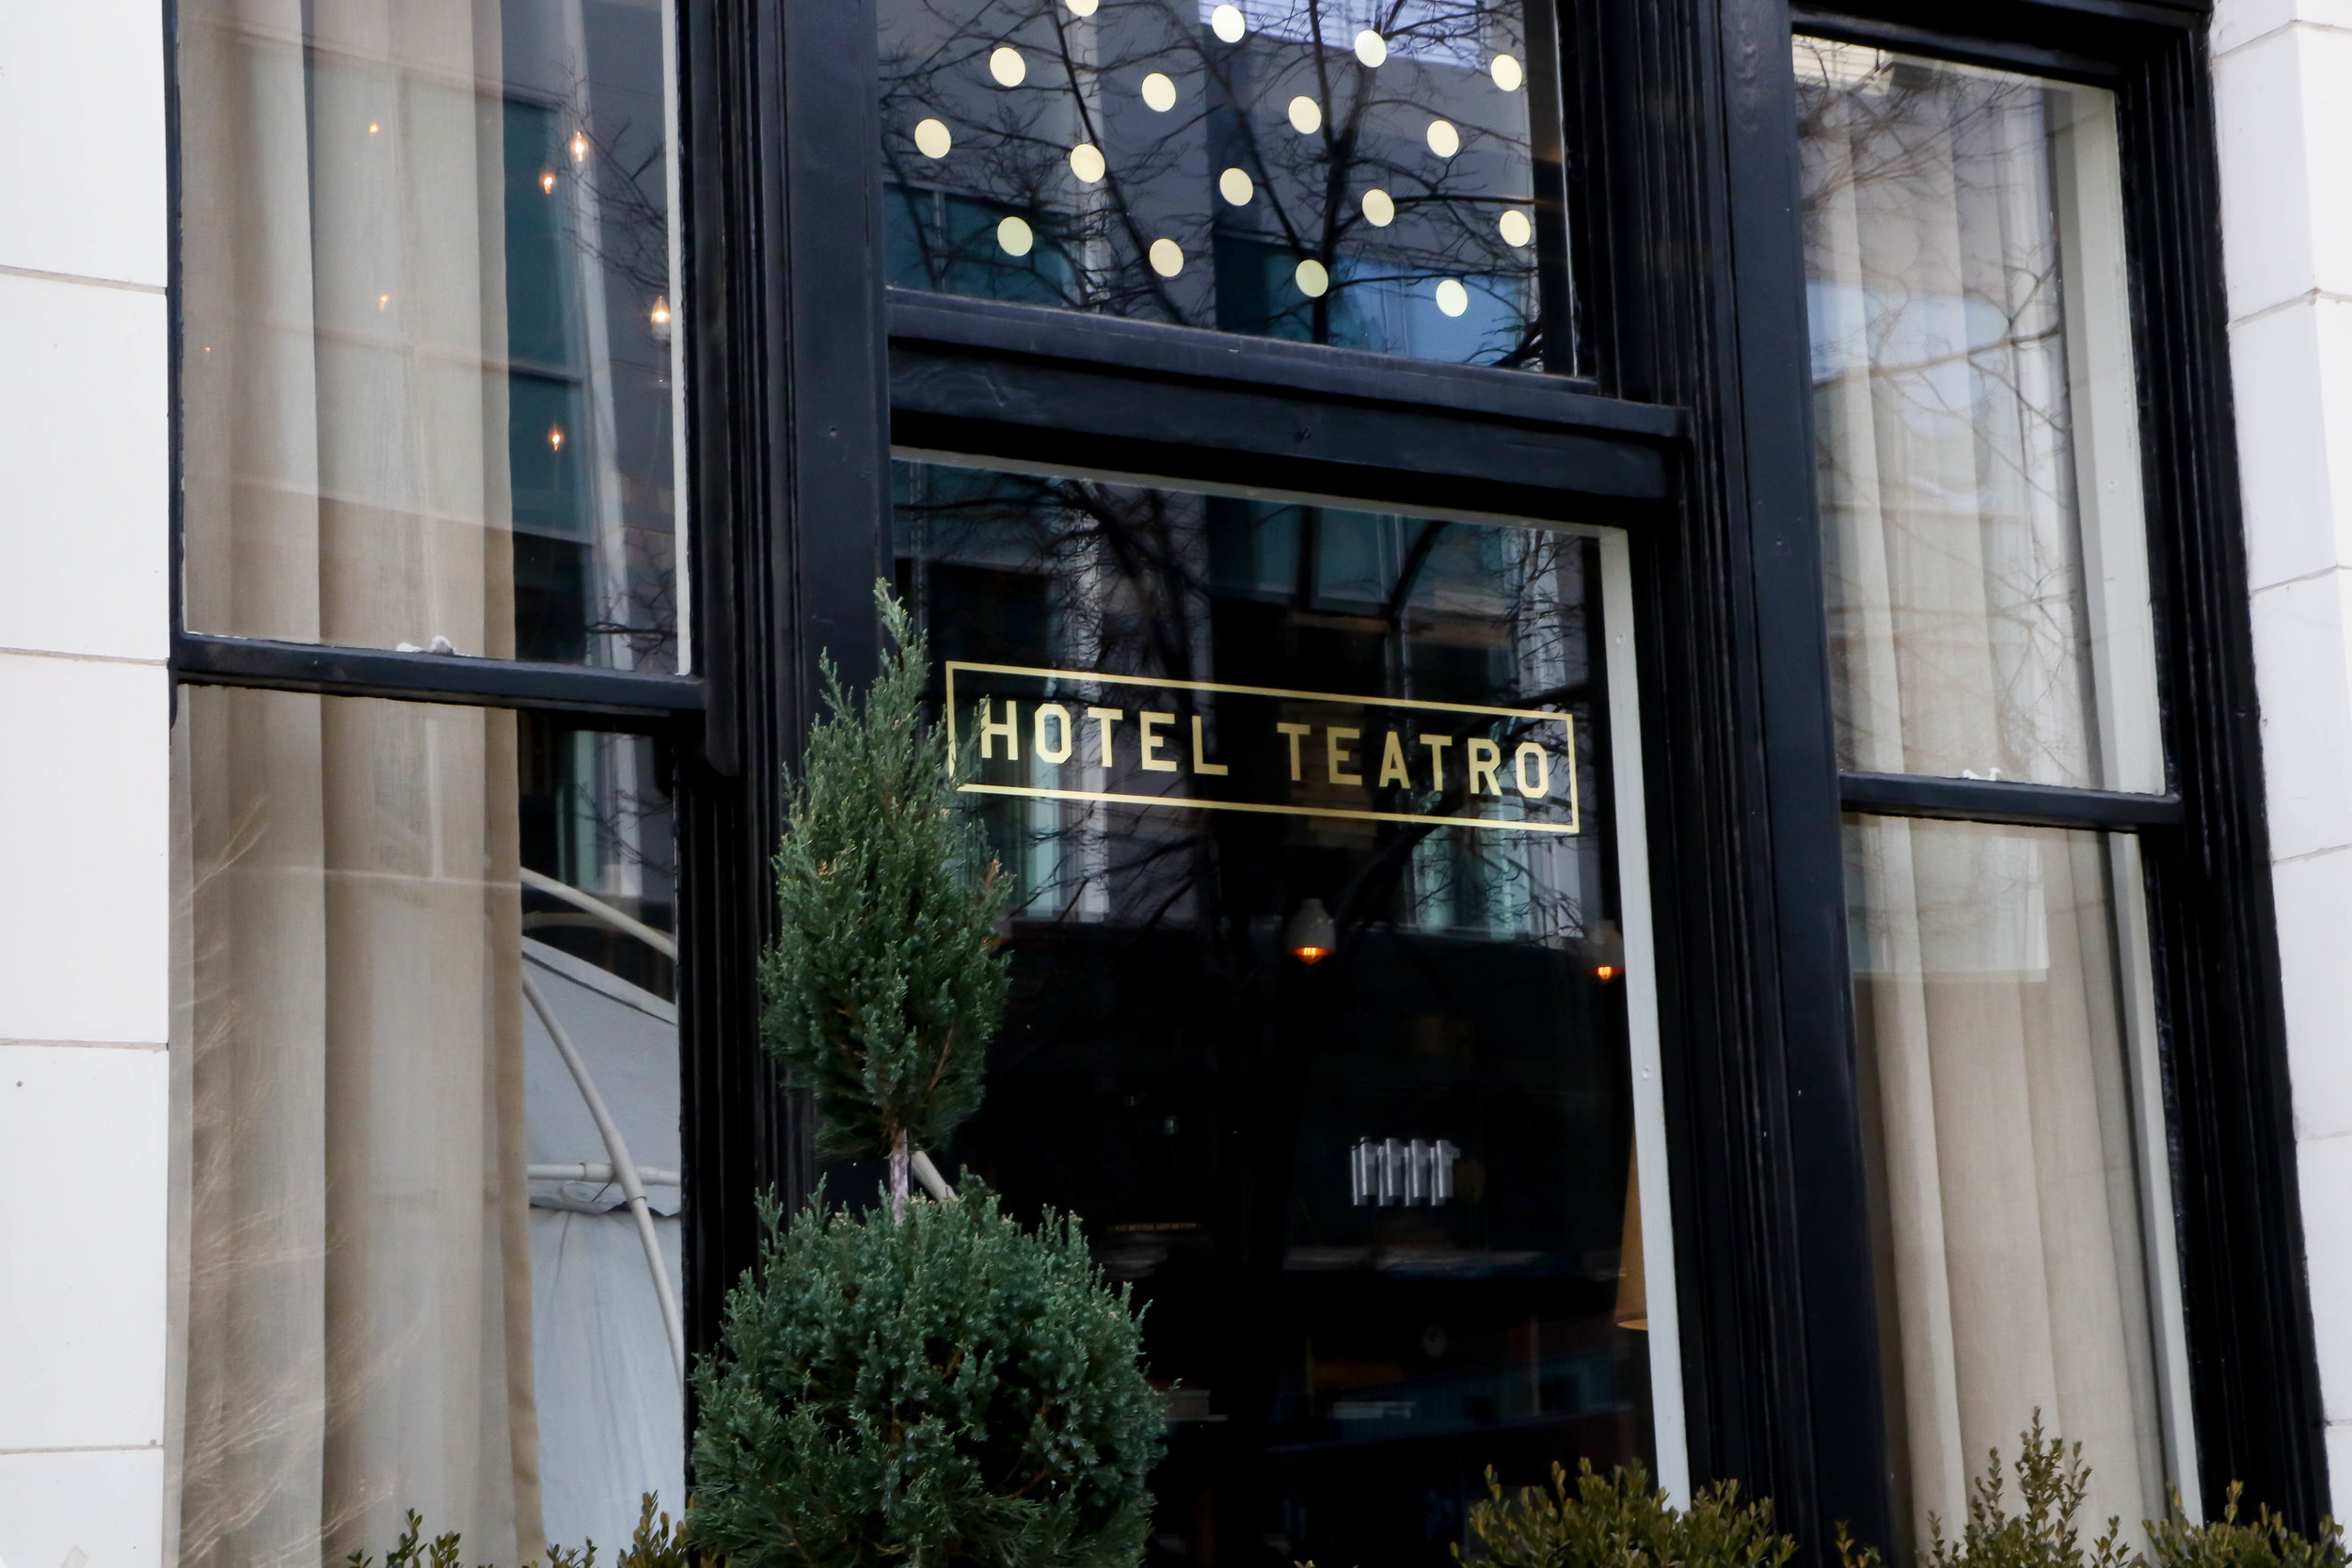 Hotel Teatro @14th Street LODO Denver